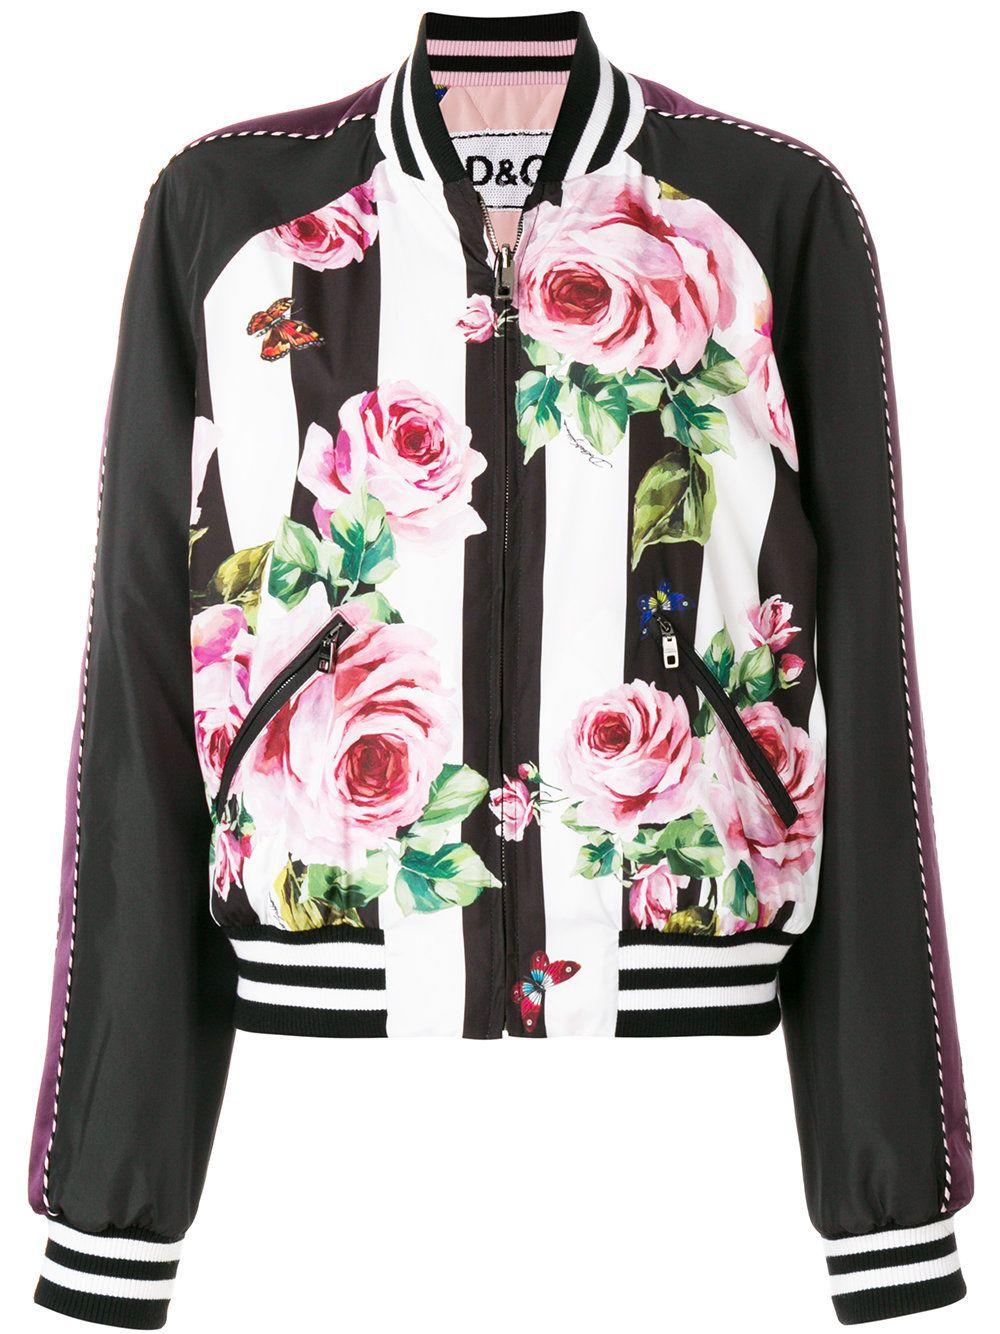 f3bfbecf8a5 Dolce   Gabbana куртка-бомбер с принтом роз